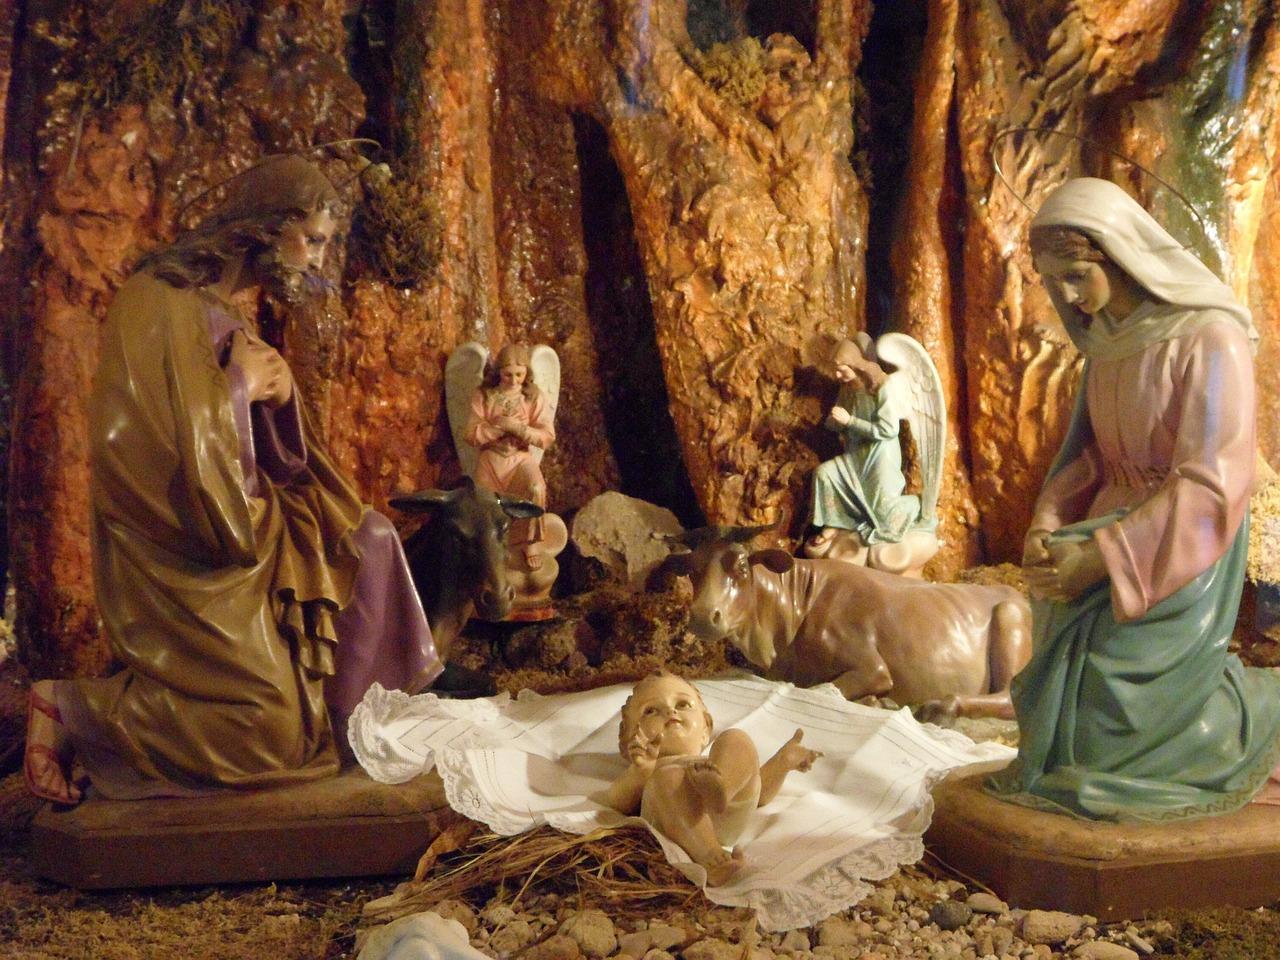 FESTIVIDAD DE LA SAGRADA FAMILIA: JESÚS MARIA Y JOSE